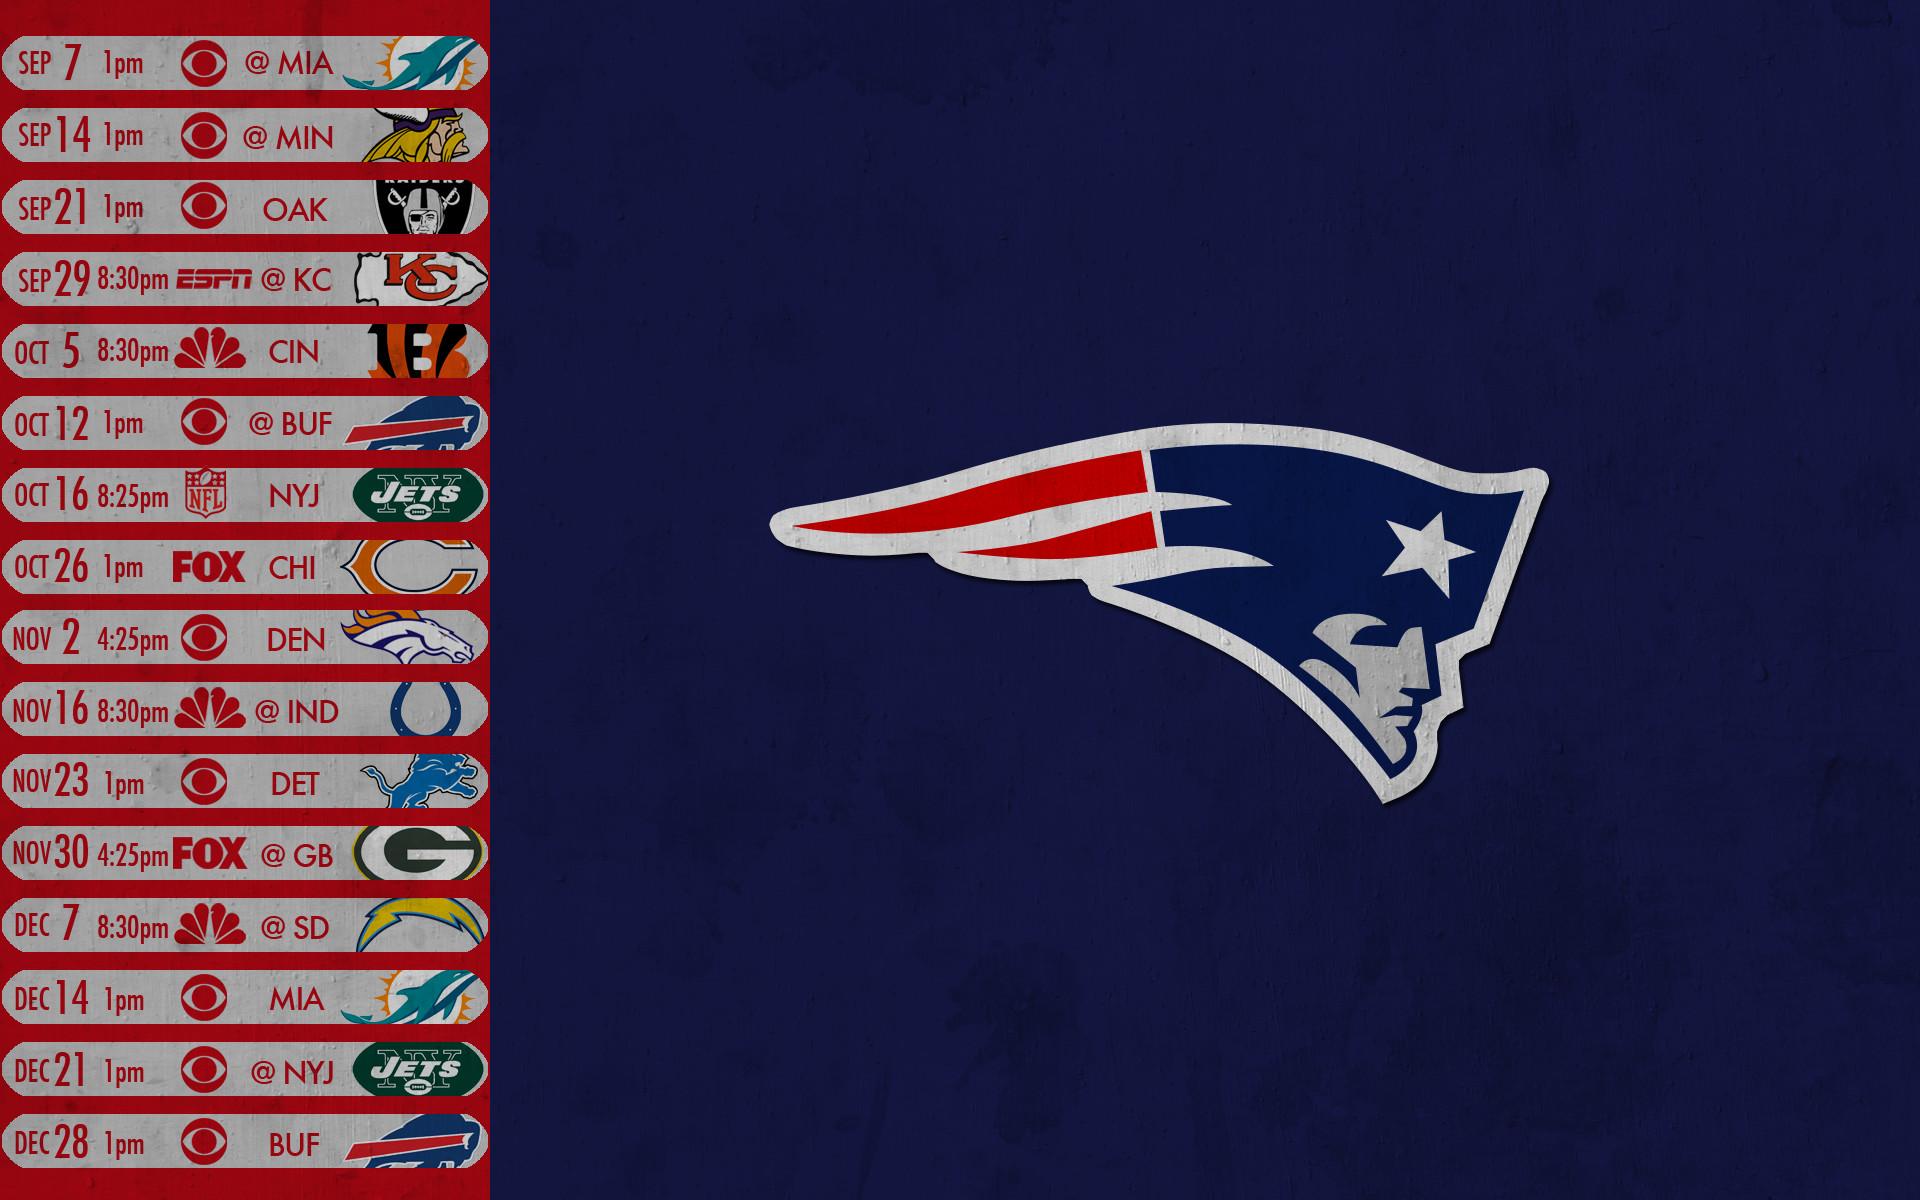 4k Ultra Hd Wallpaper - New England Patriots Logo - HD Wallpaper